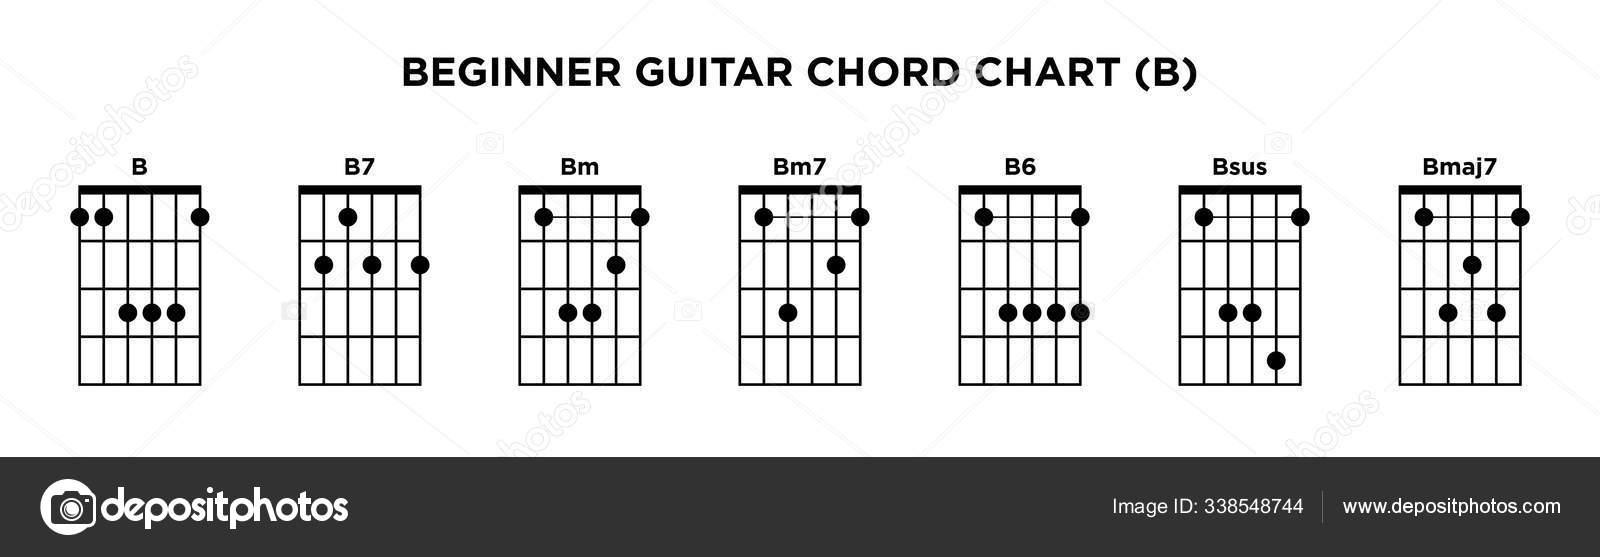 15 Guitar chord chart Vector Images   Free & Royalty free Guitar ...